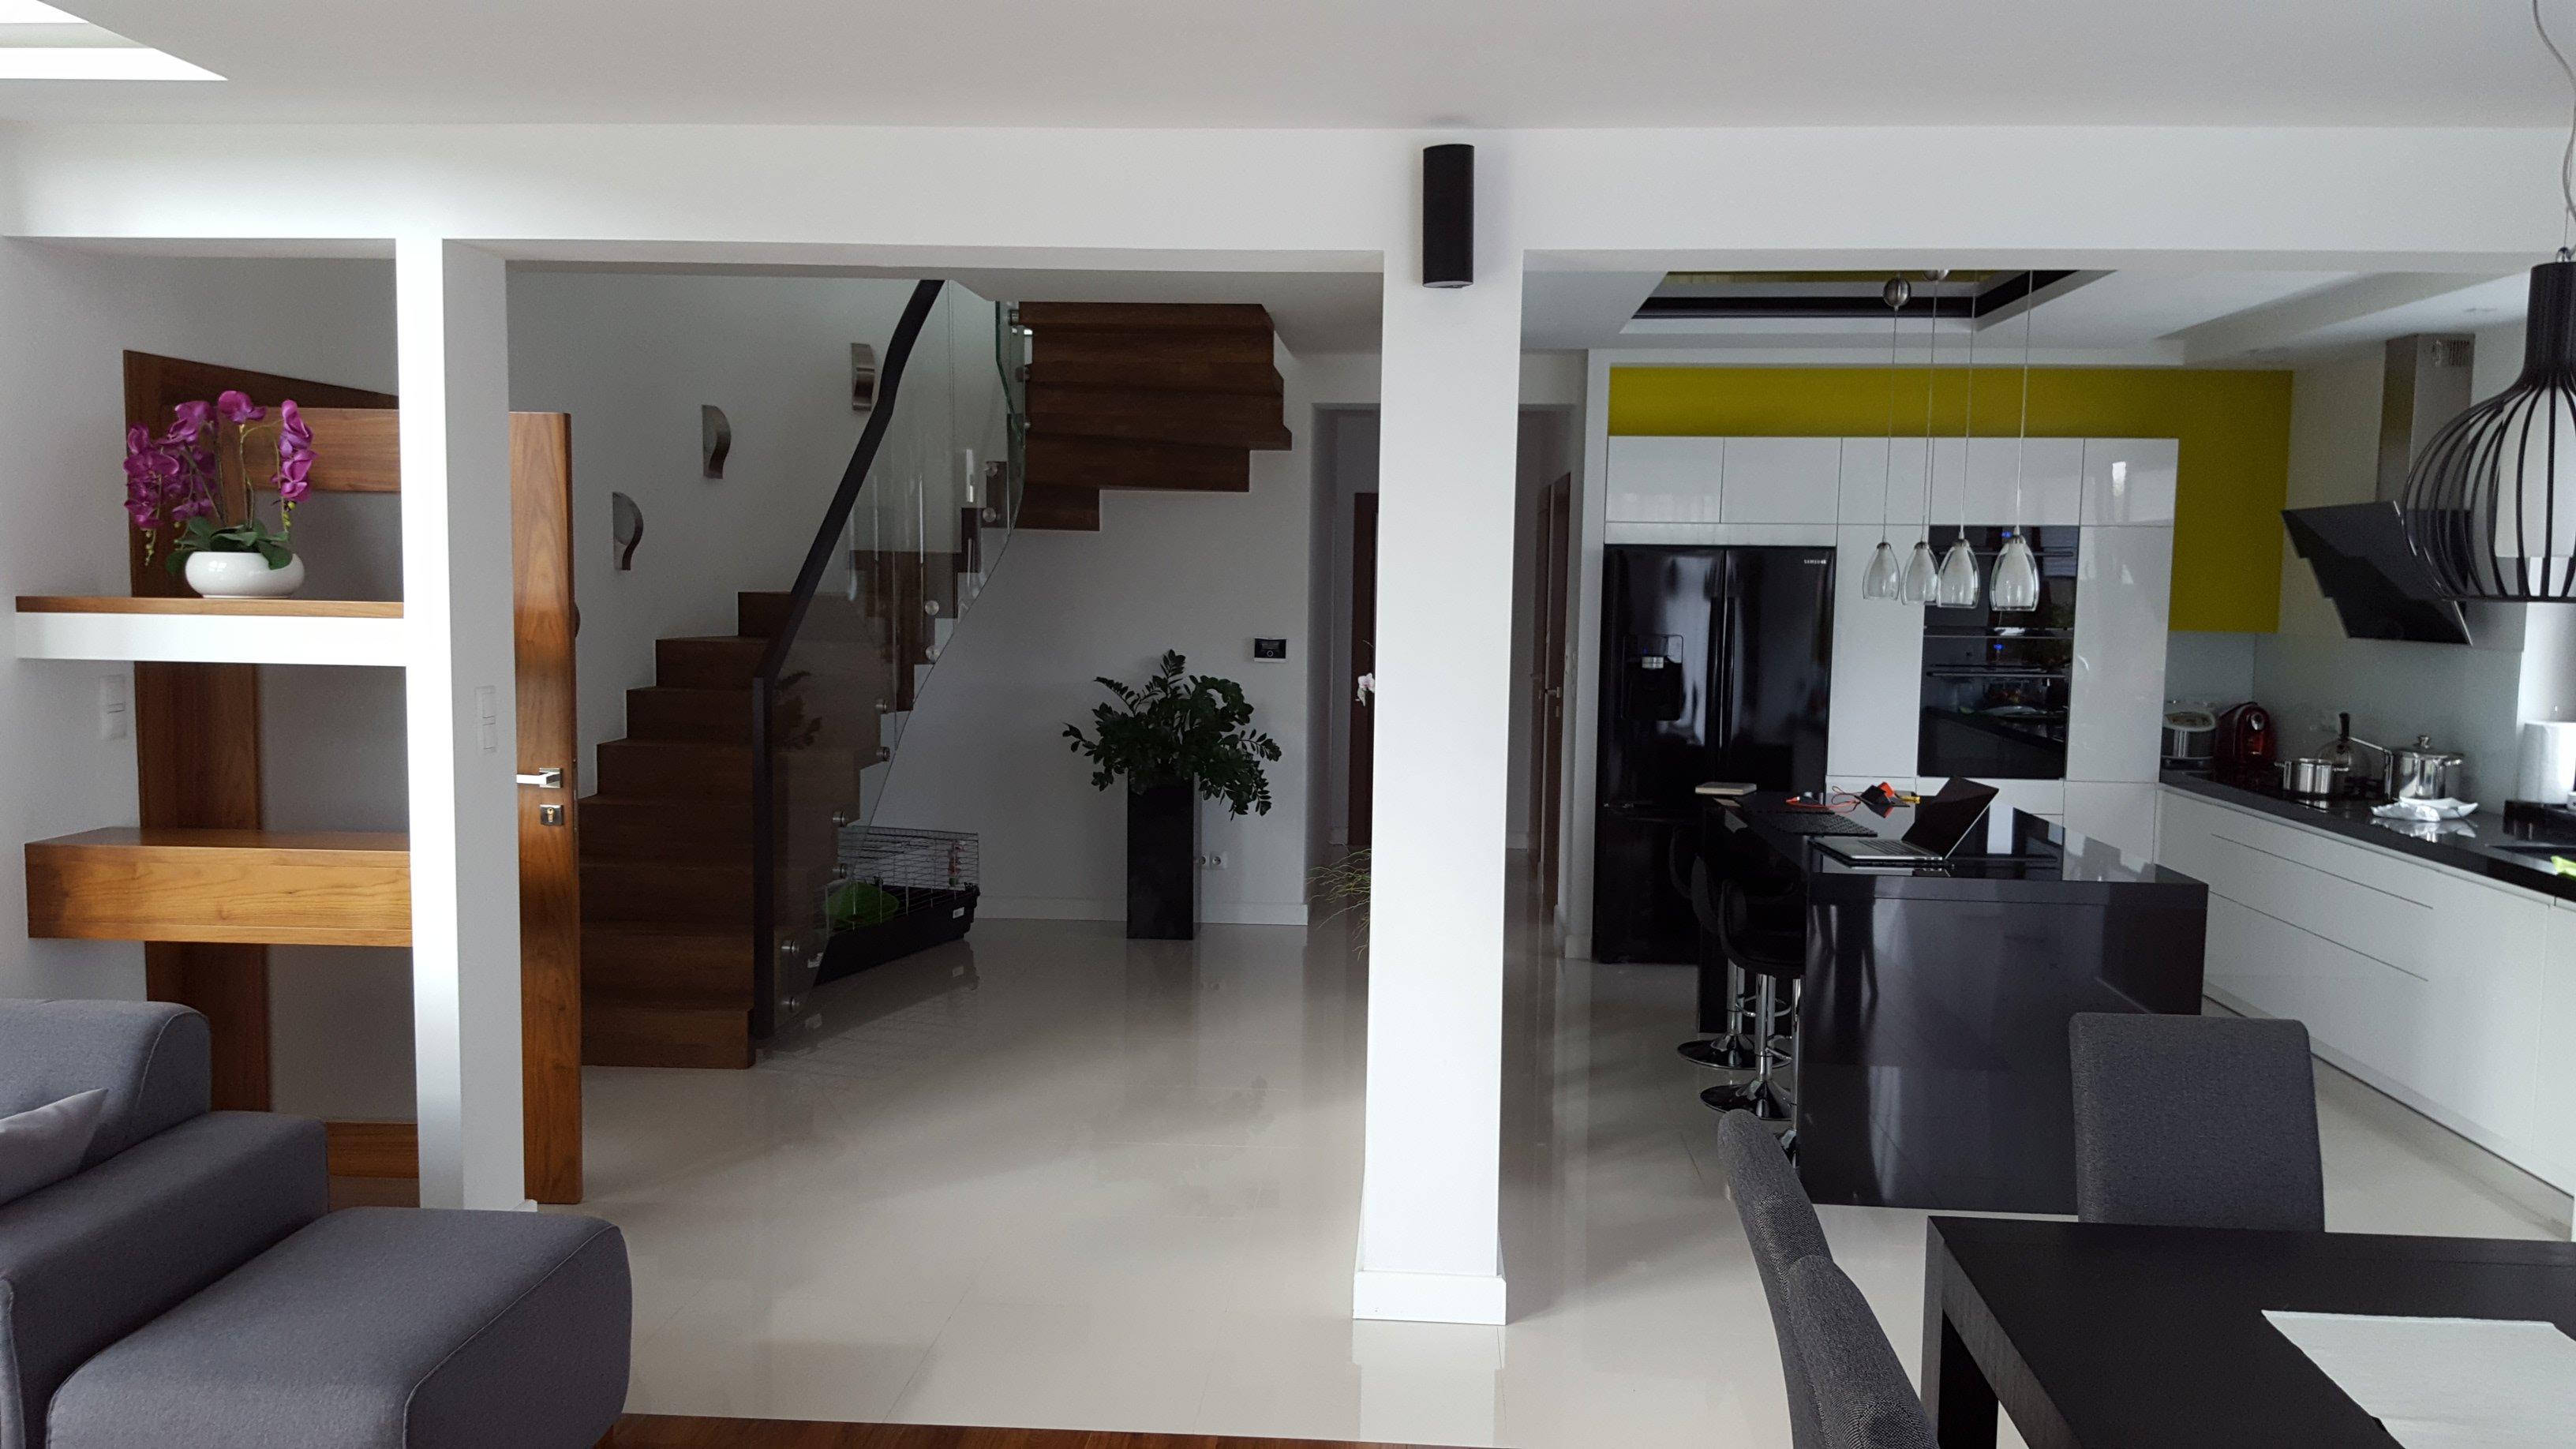 projekt-domu-riwiera-fot-27-1470049990-4rgv8c63.jpg